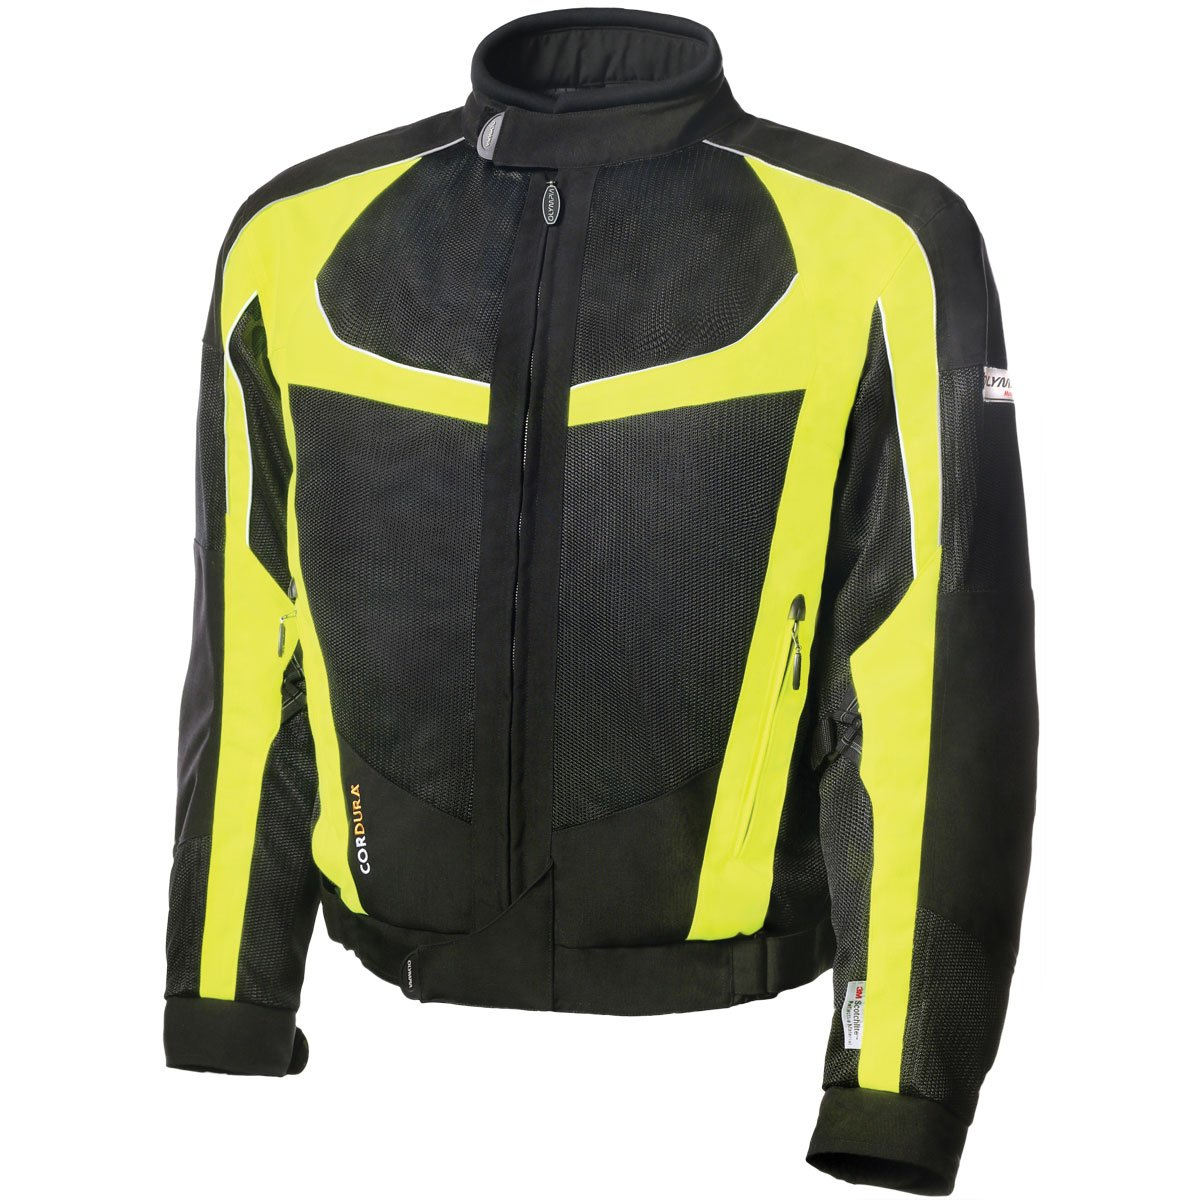 Olympia Moto Sports Men's Switchback 2 Mesh Tech Jacket (Black/Neon Yellow, X-Large)